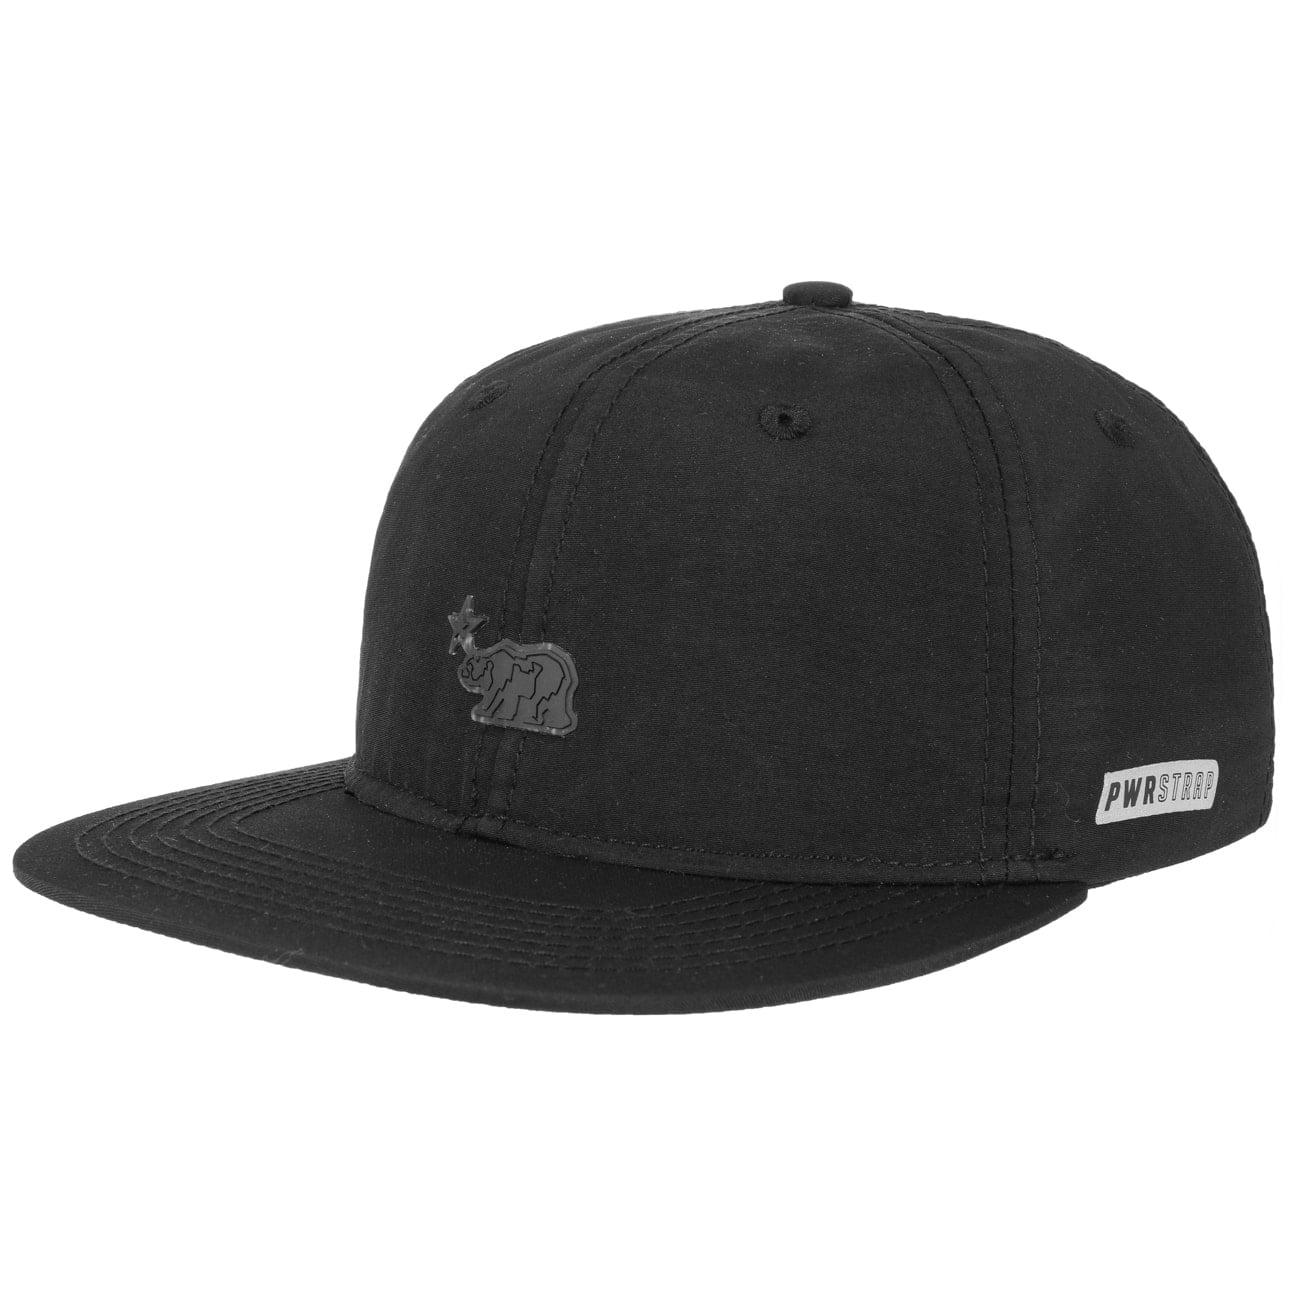 Casquette QD Dolo Strapback by Official Headwear  baseball cap